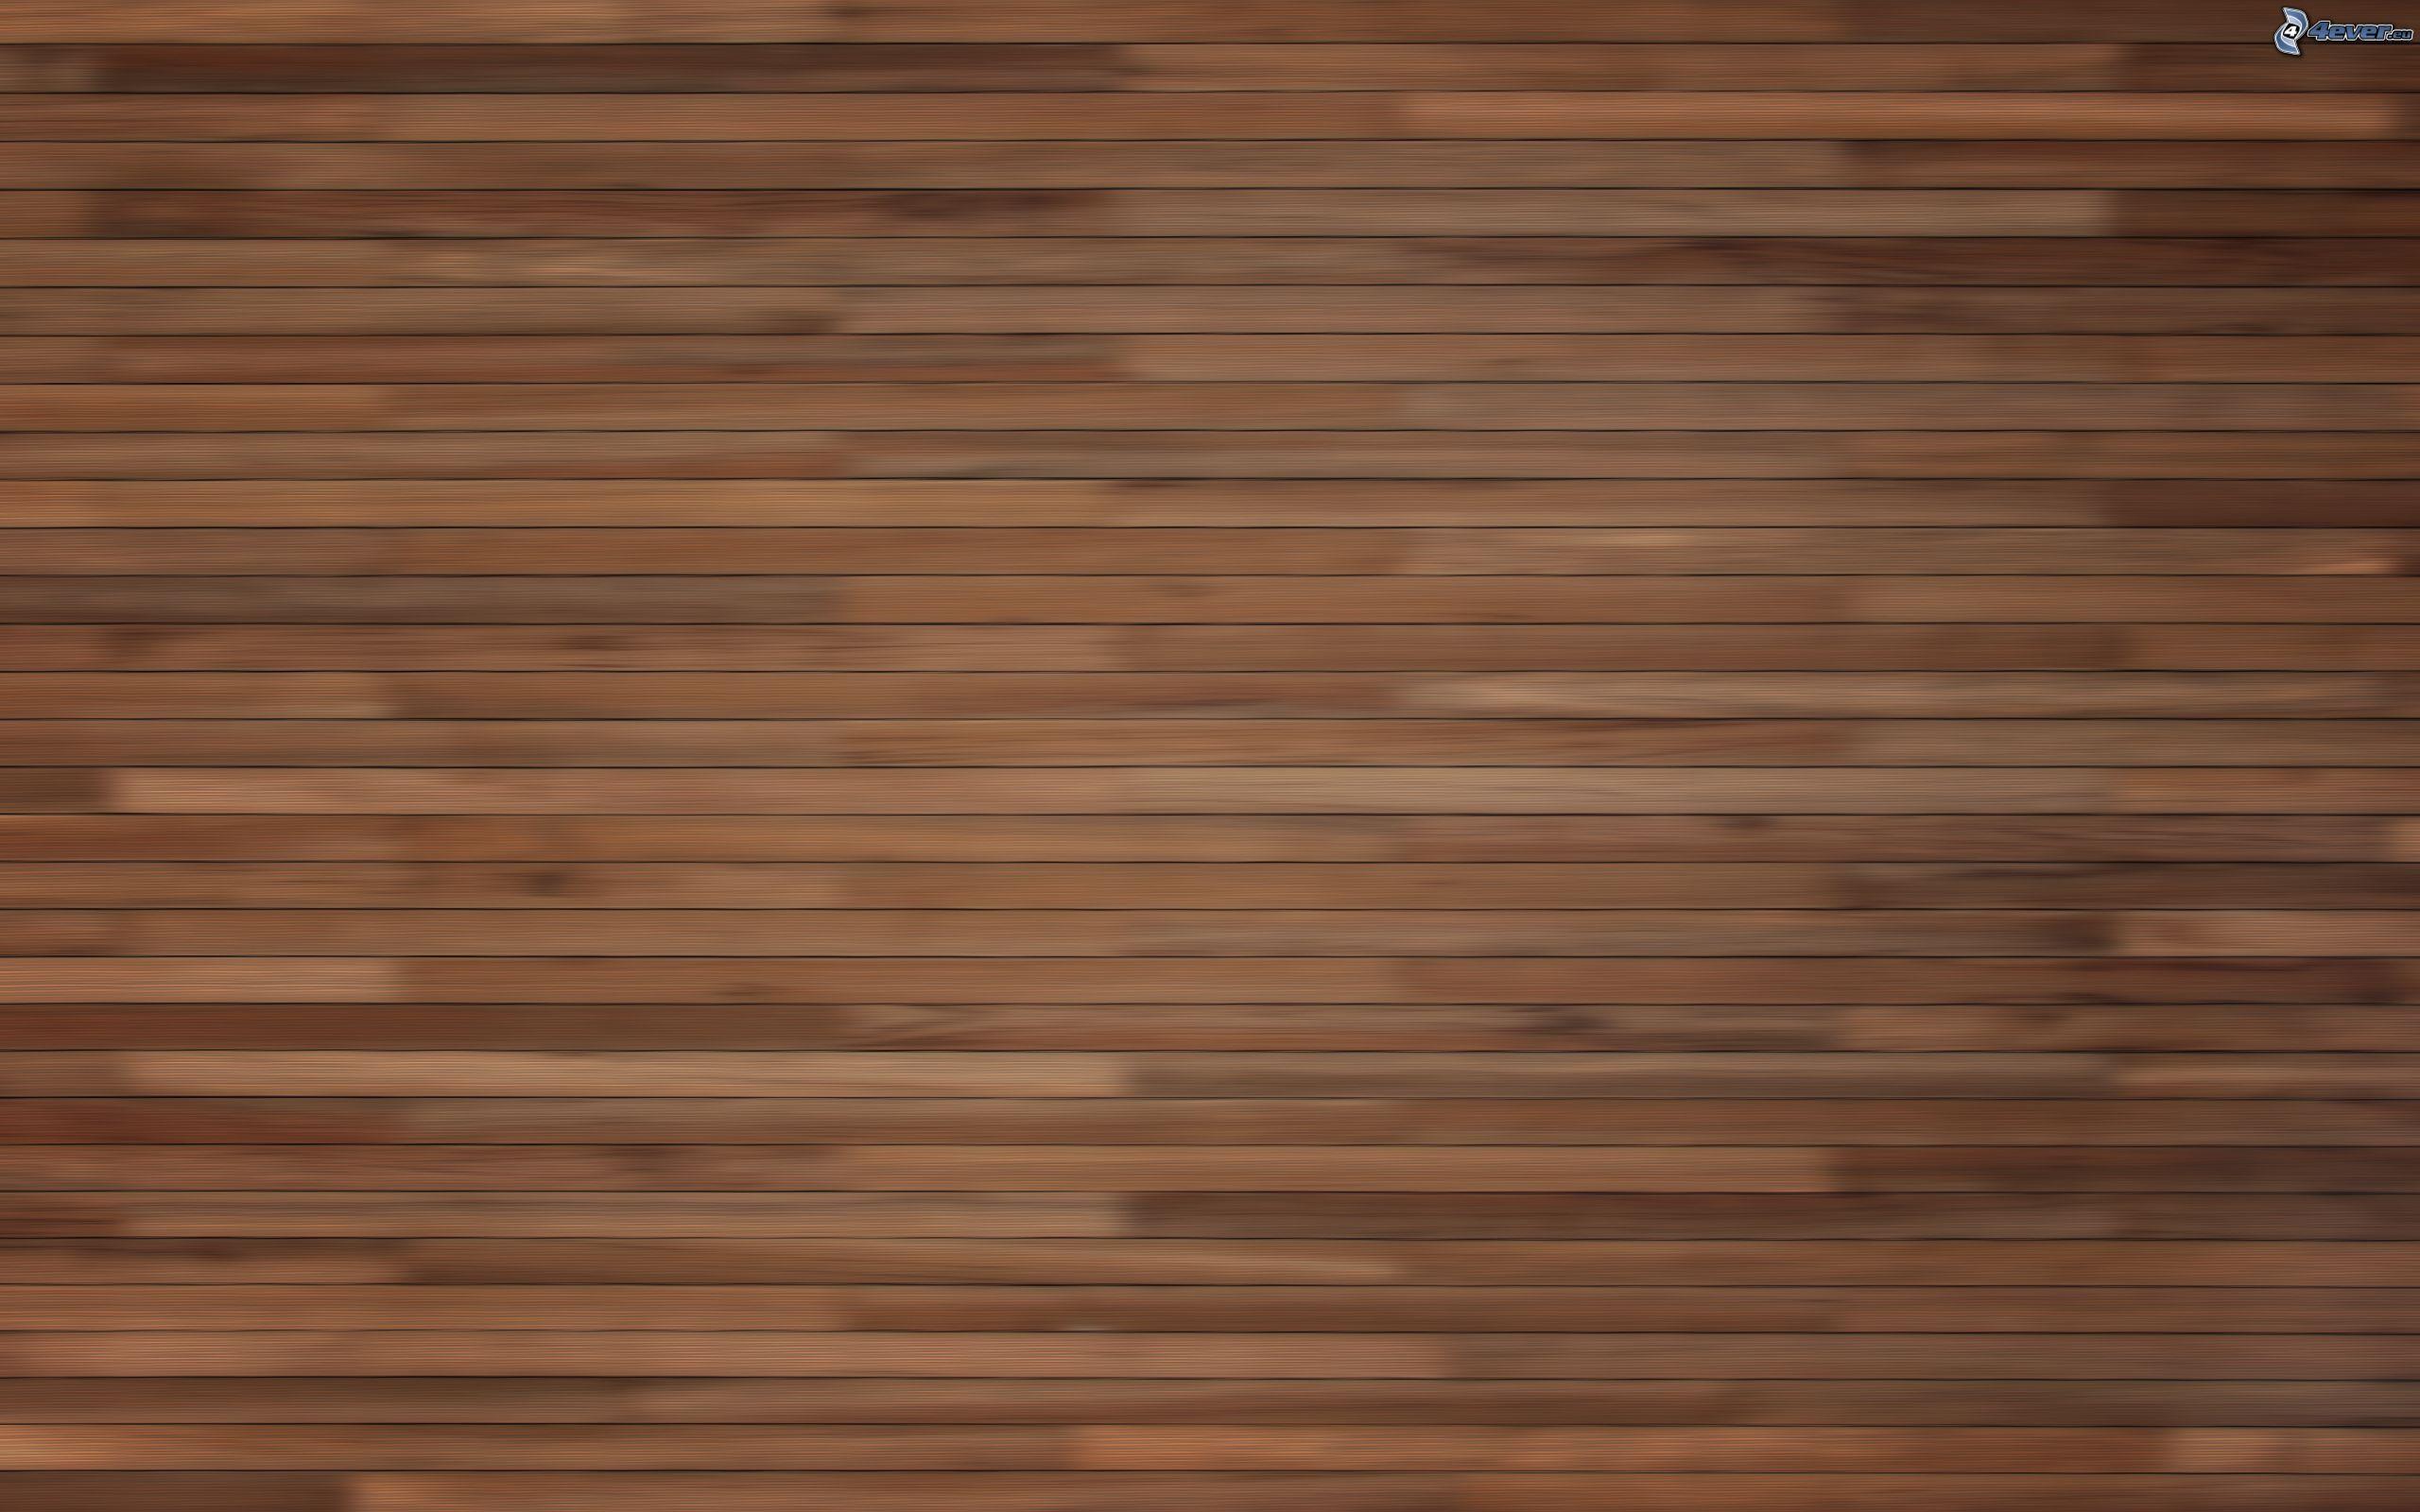 Pared de madera - Madera para paredes ...